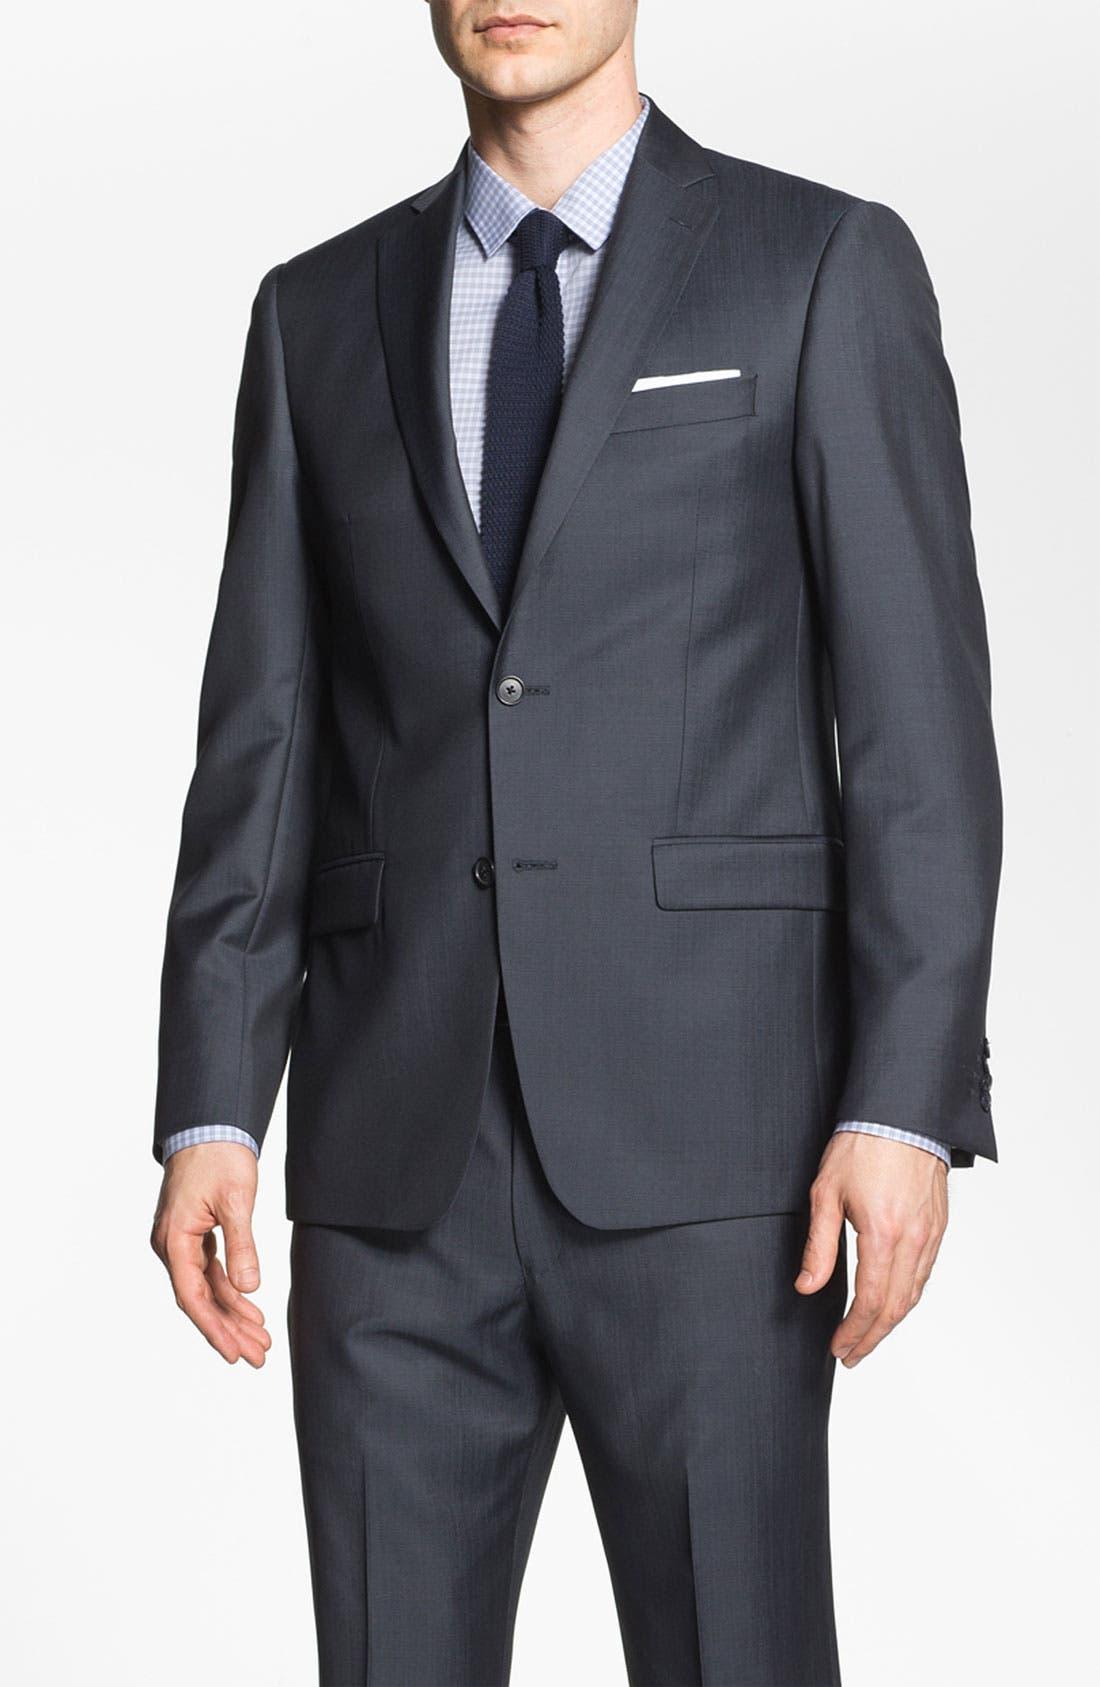 Alternate Image 1 Selected - Michael Kors Trim Fit Twill Suit